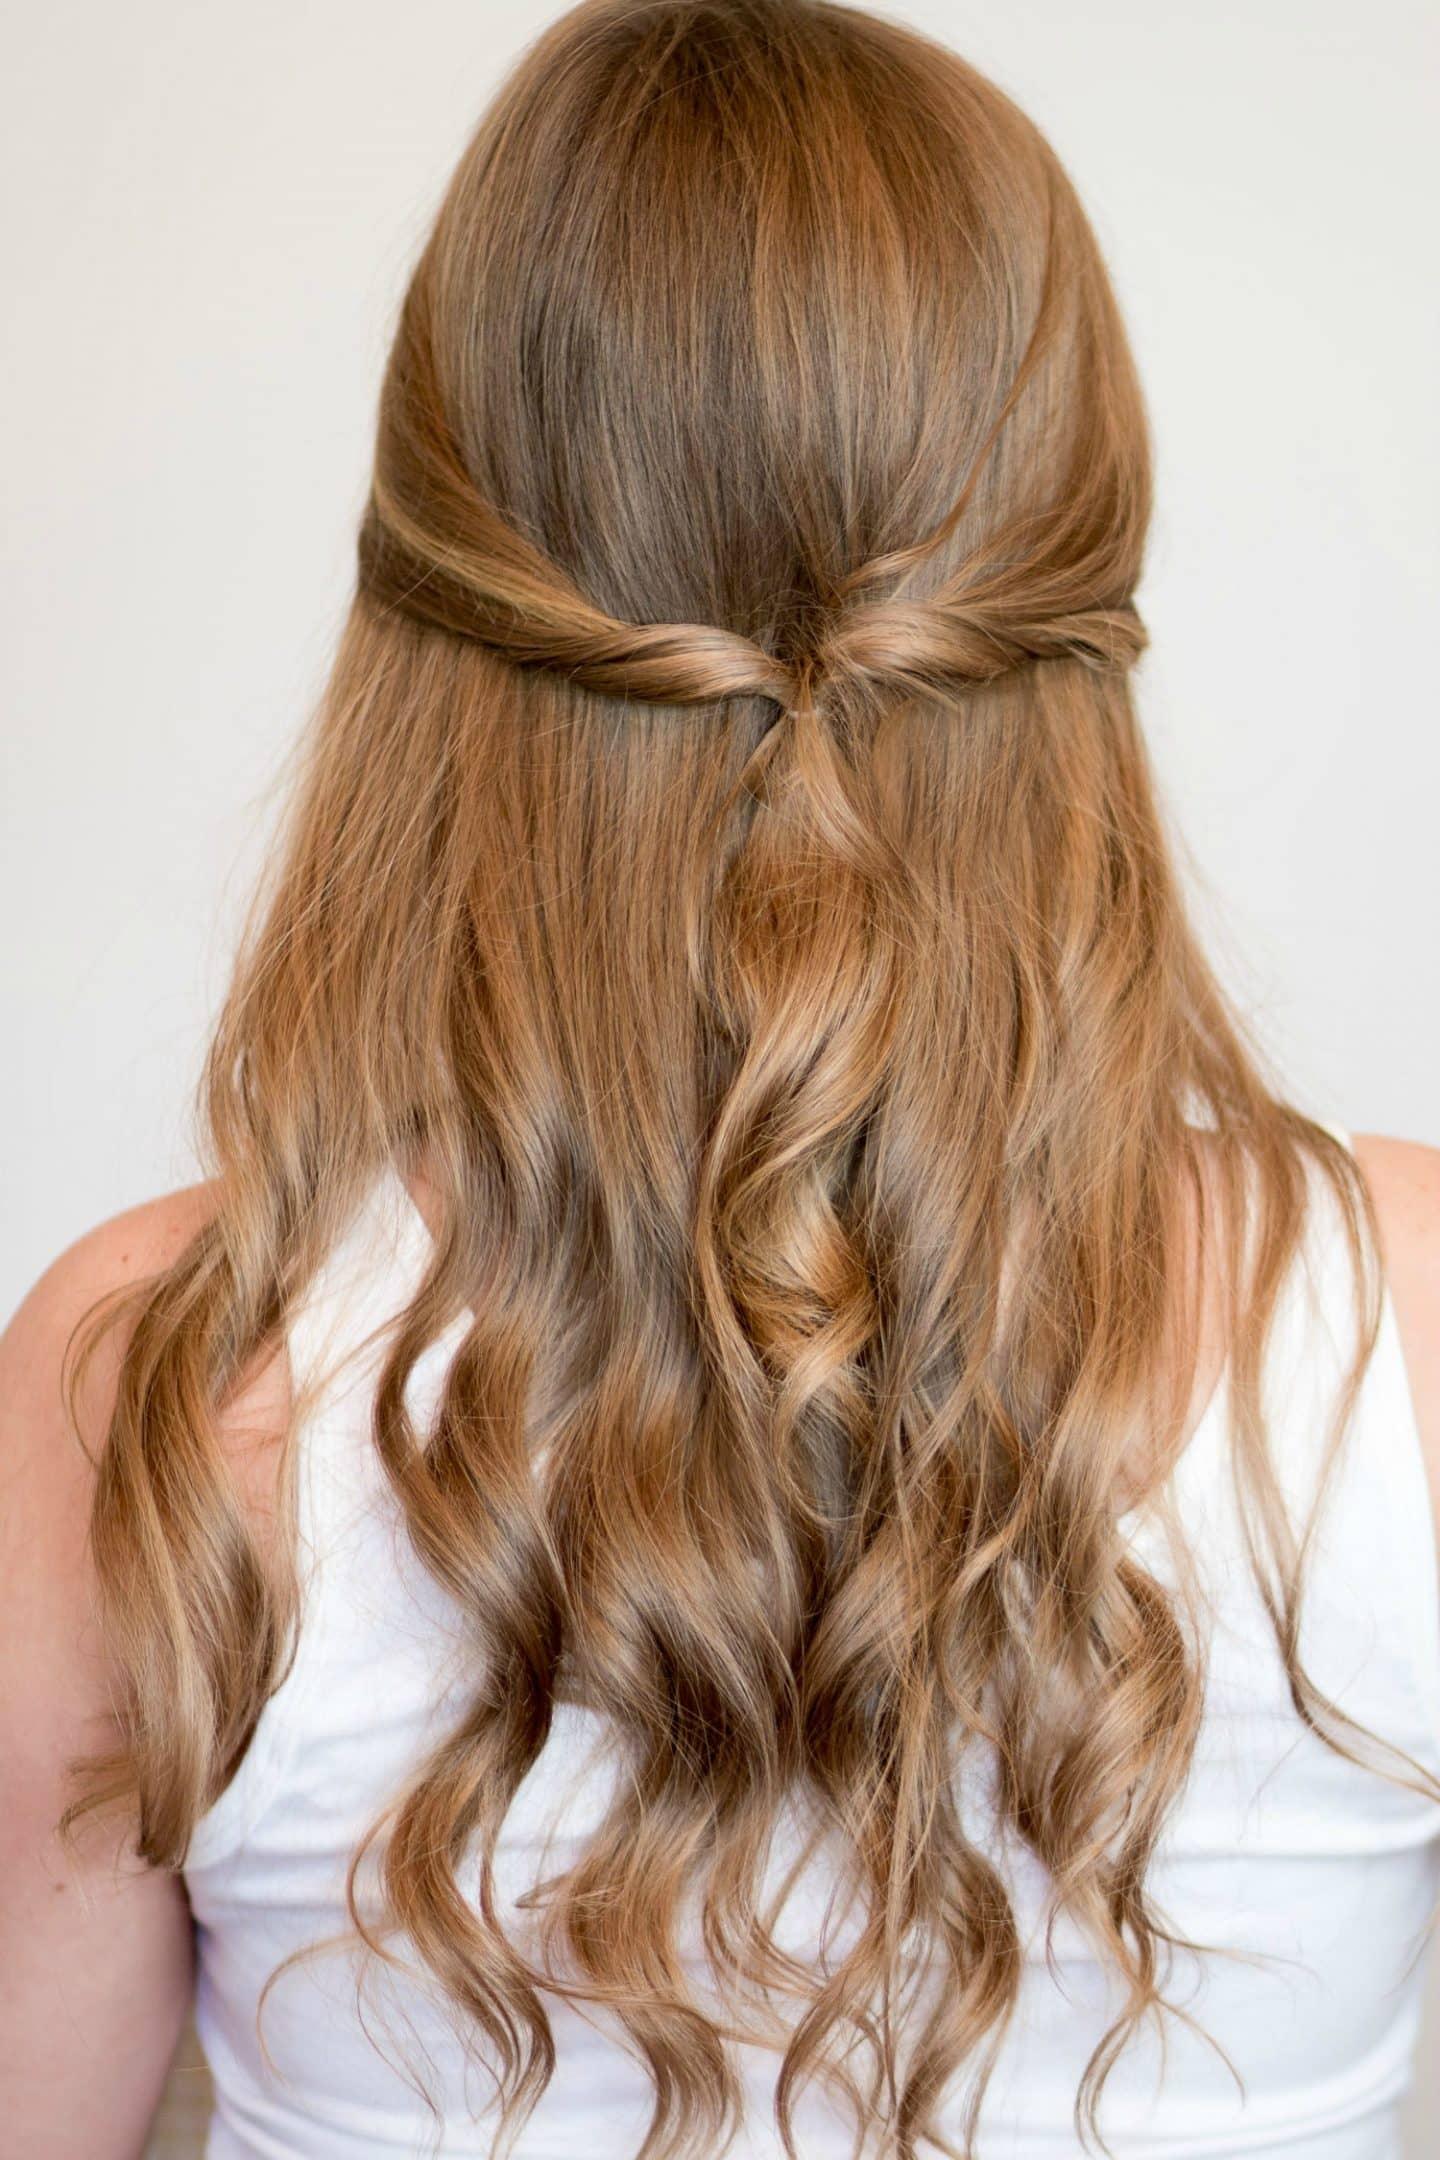 Easy Heatless Hairstyles for Long Hair | Ashley Brooke Nicholas